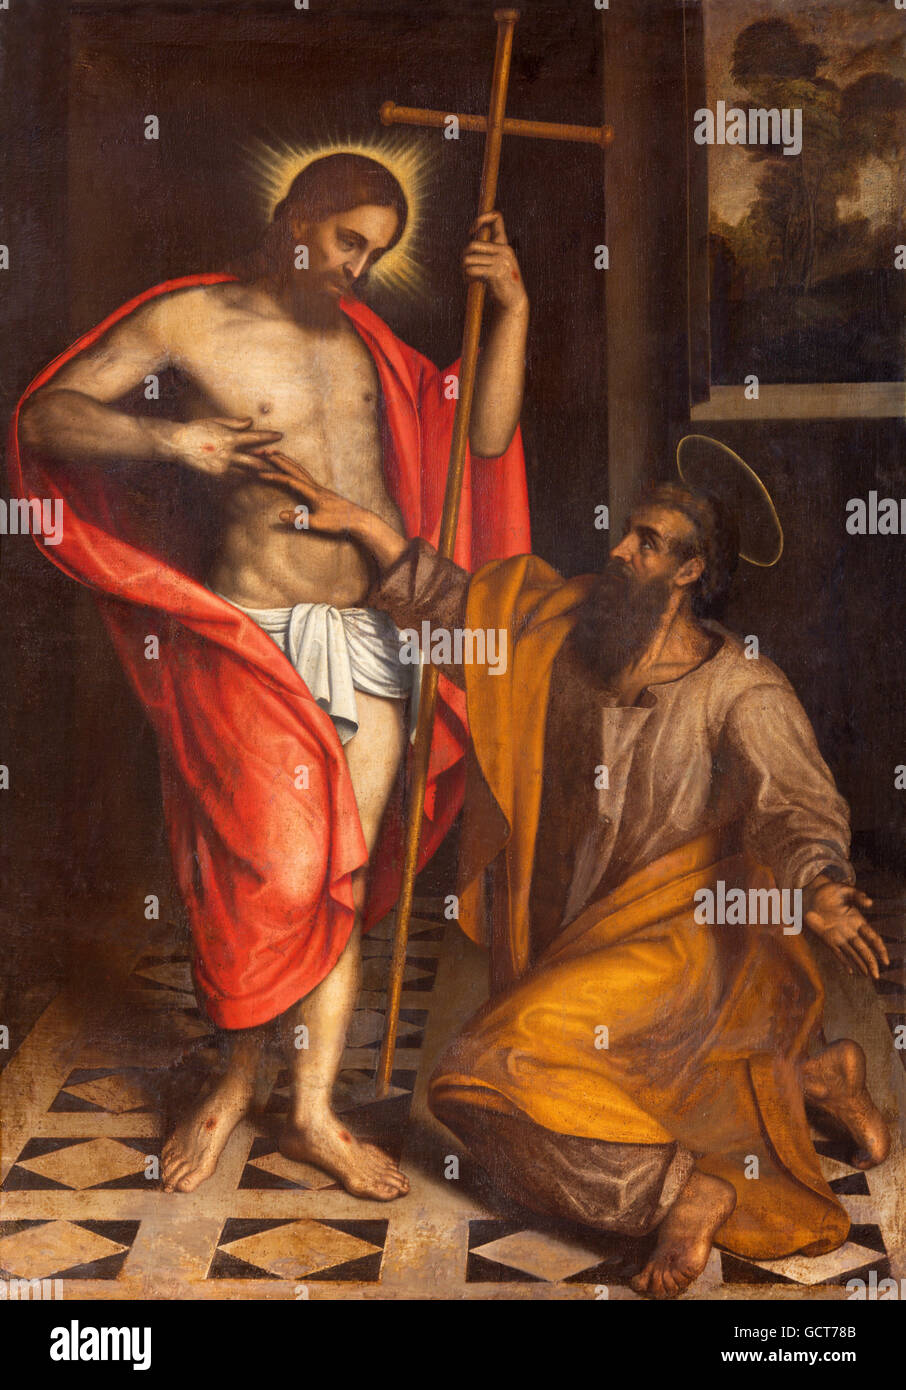 BRESCIA, ITALIE - 22 MAI 2016: Peinture le doute de saint Thomas à l'église Chiesa di San Faustino Photo Stock